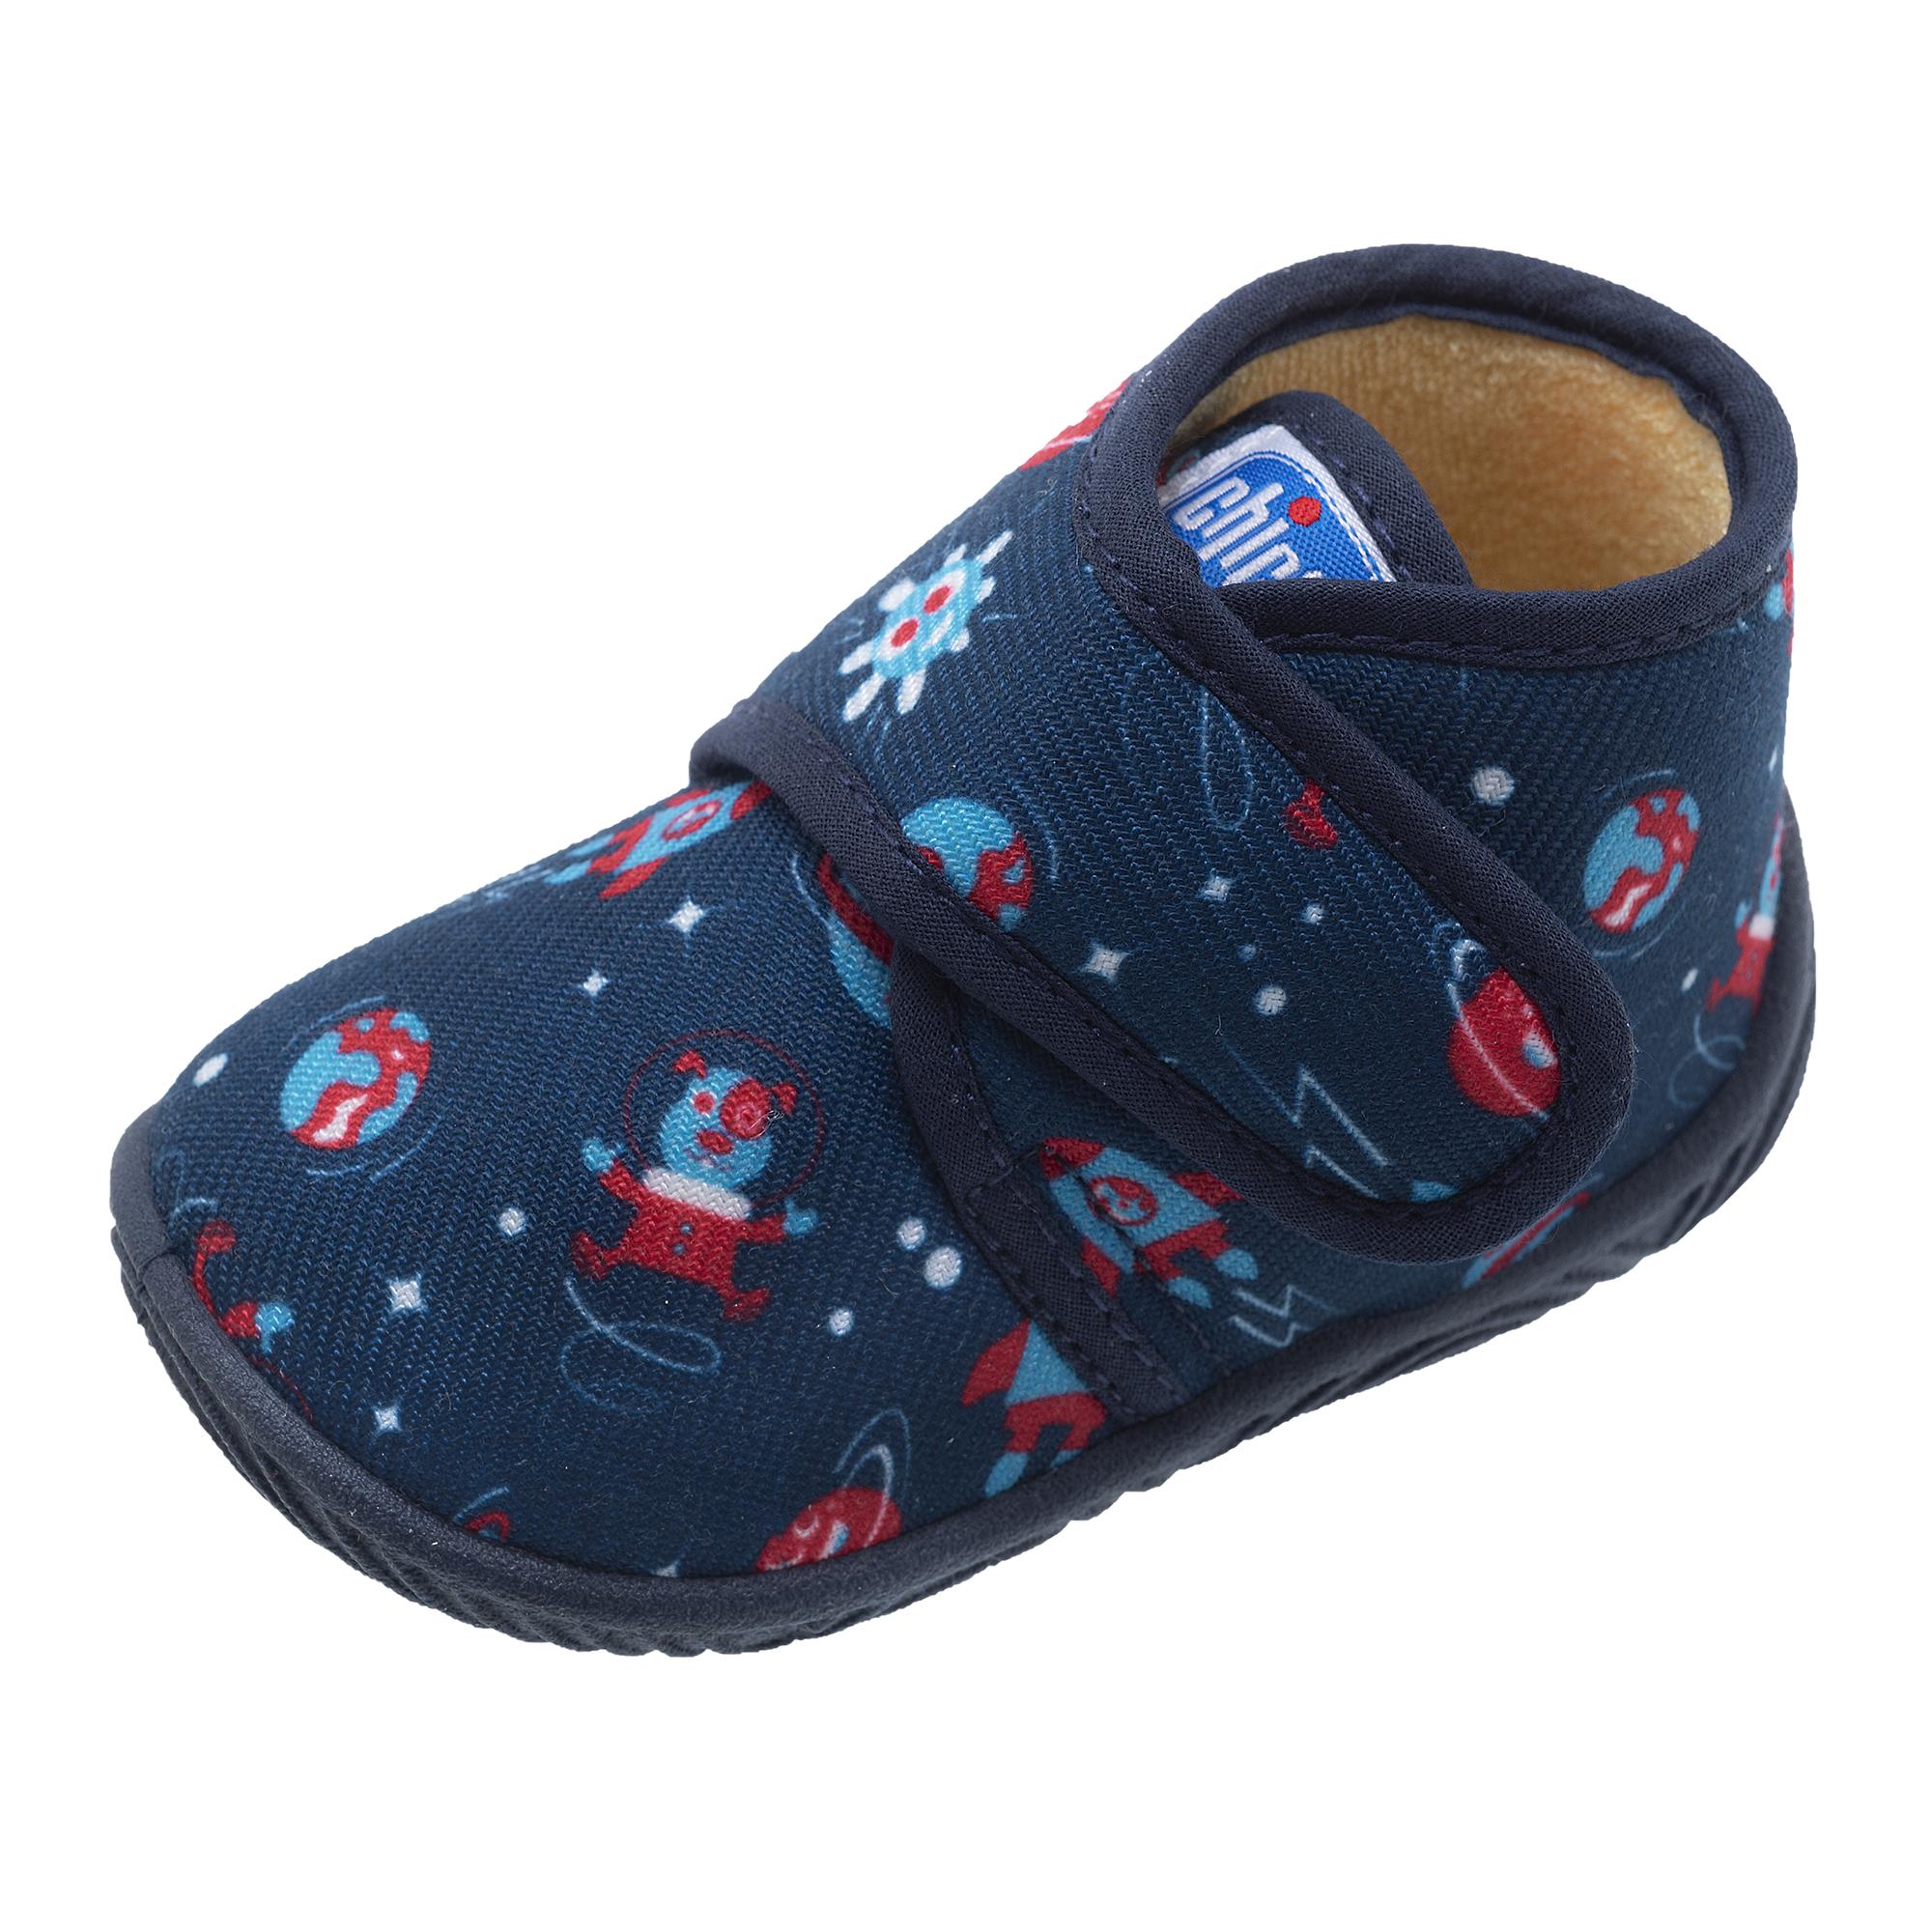 Pantofi Casa Copii Chicco, Albastru Cu Model, 64761 imagine